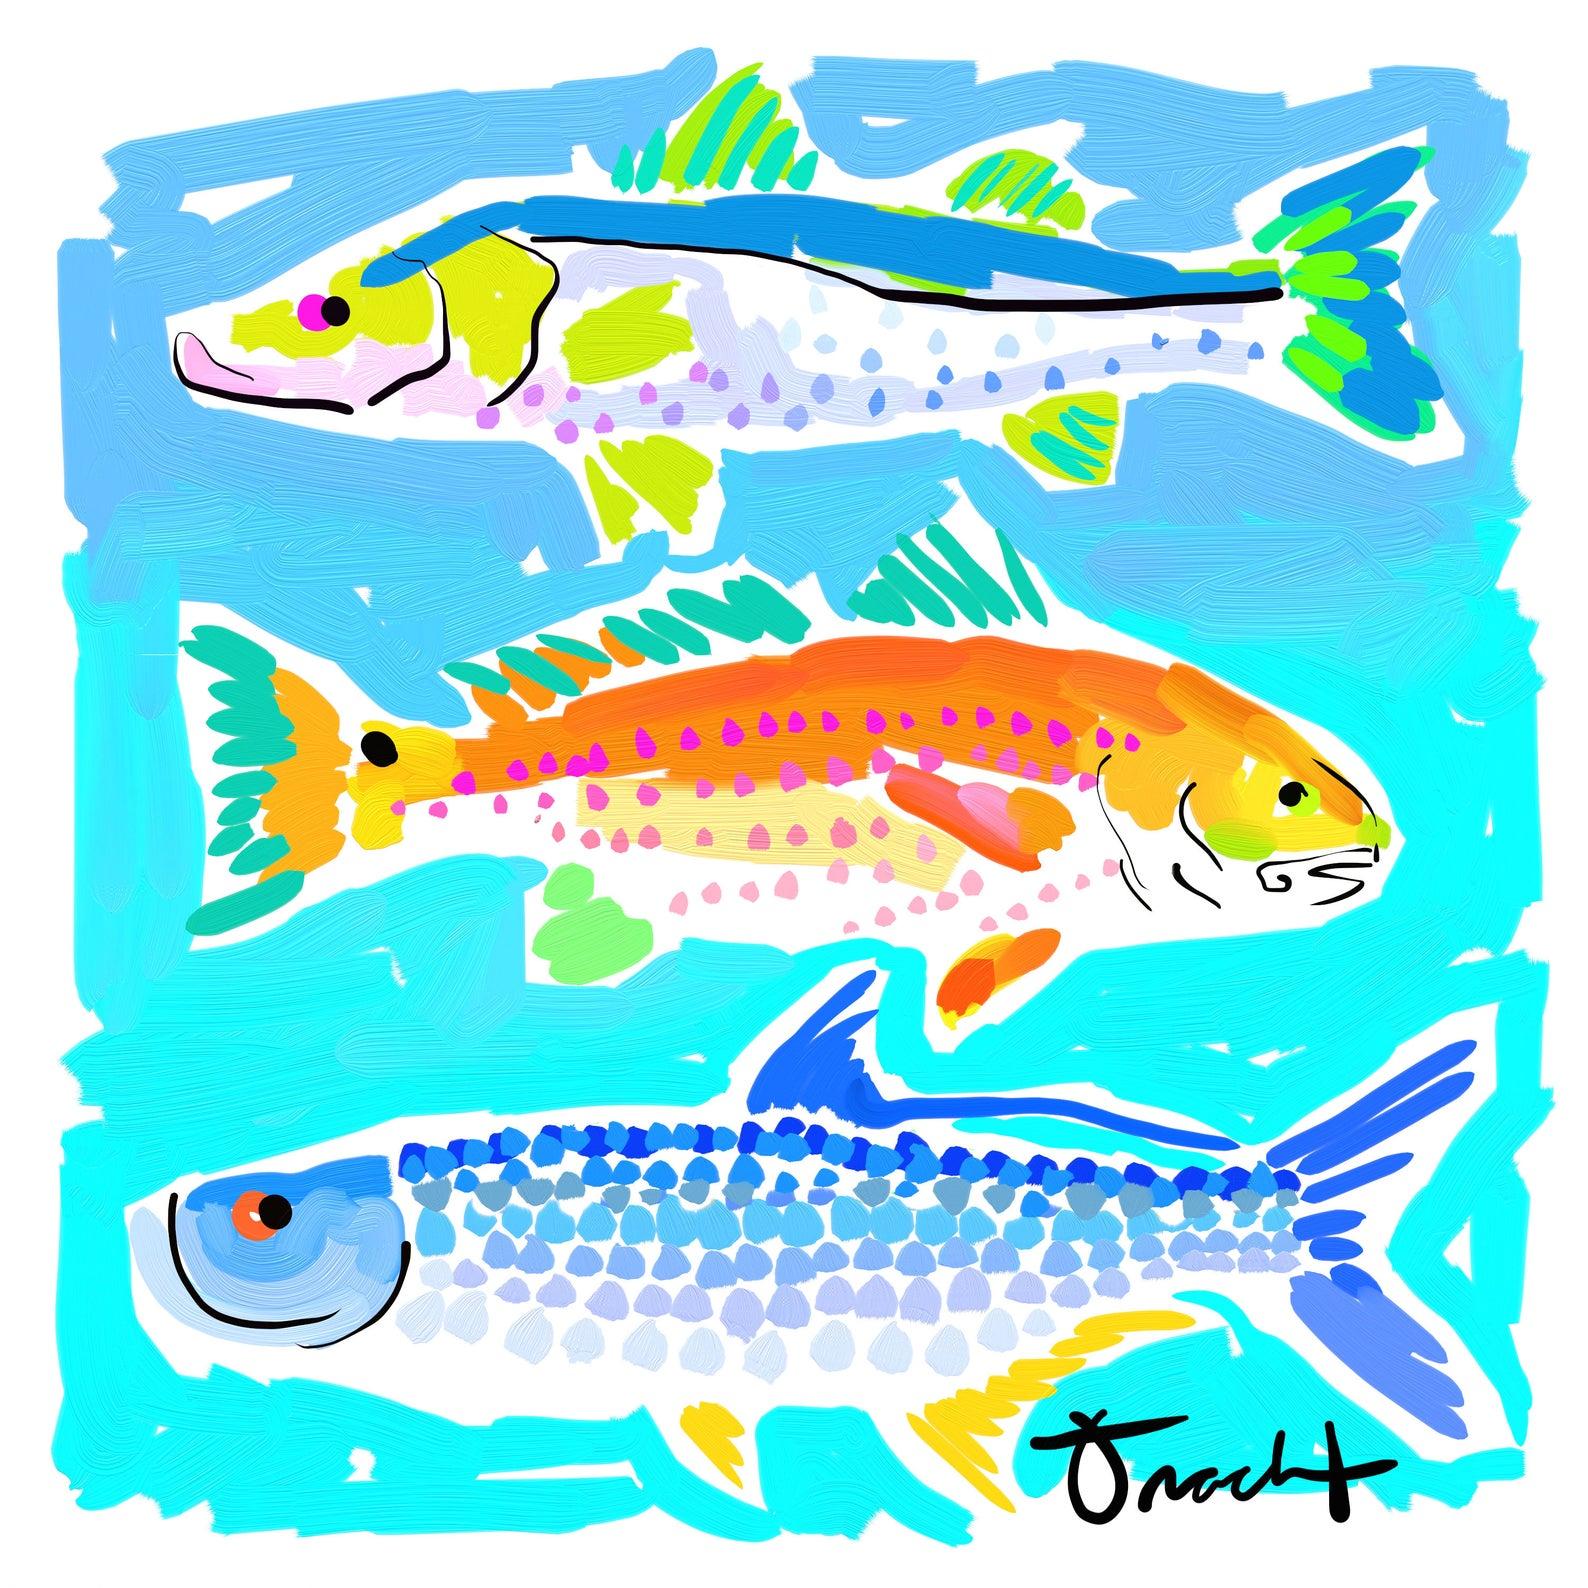 colorful art print of three fish